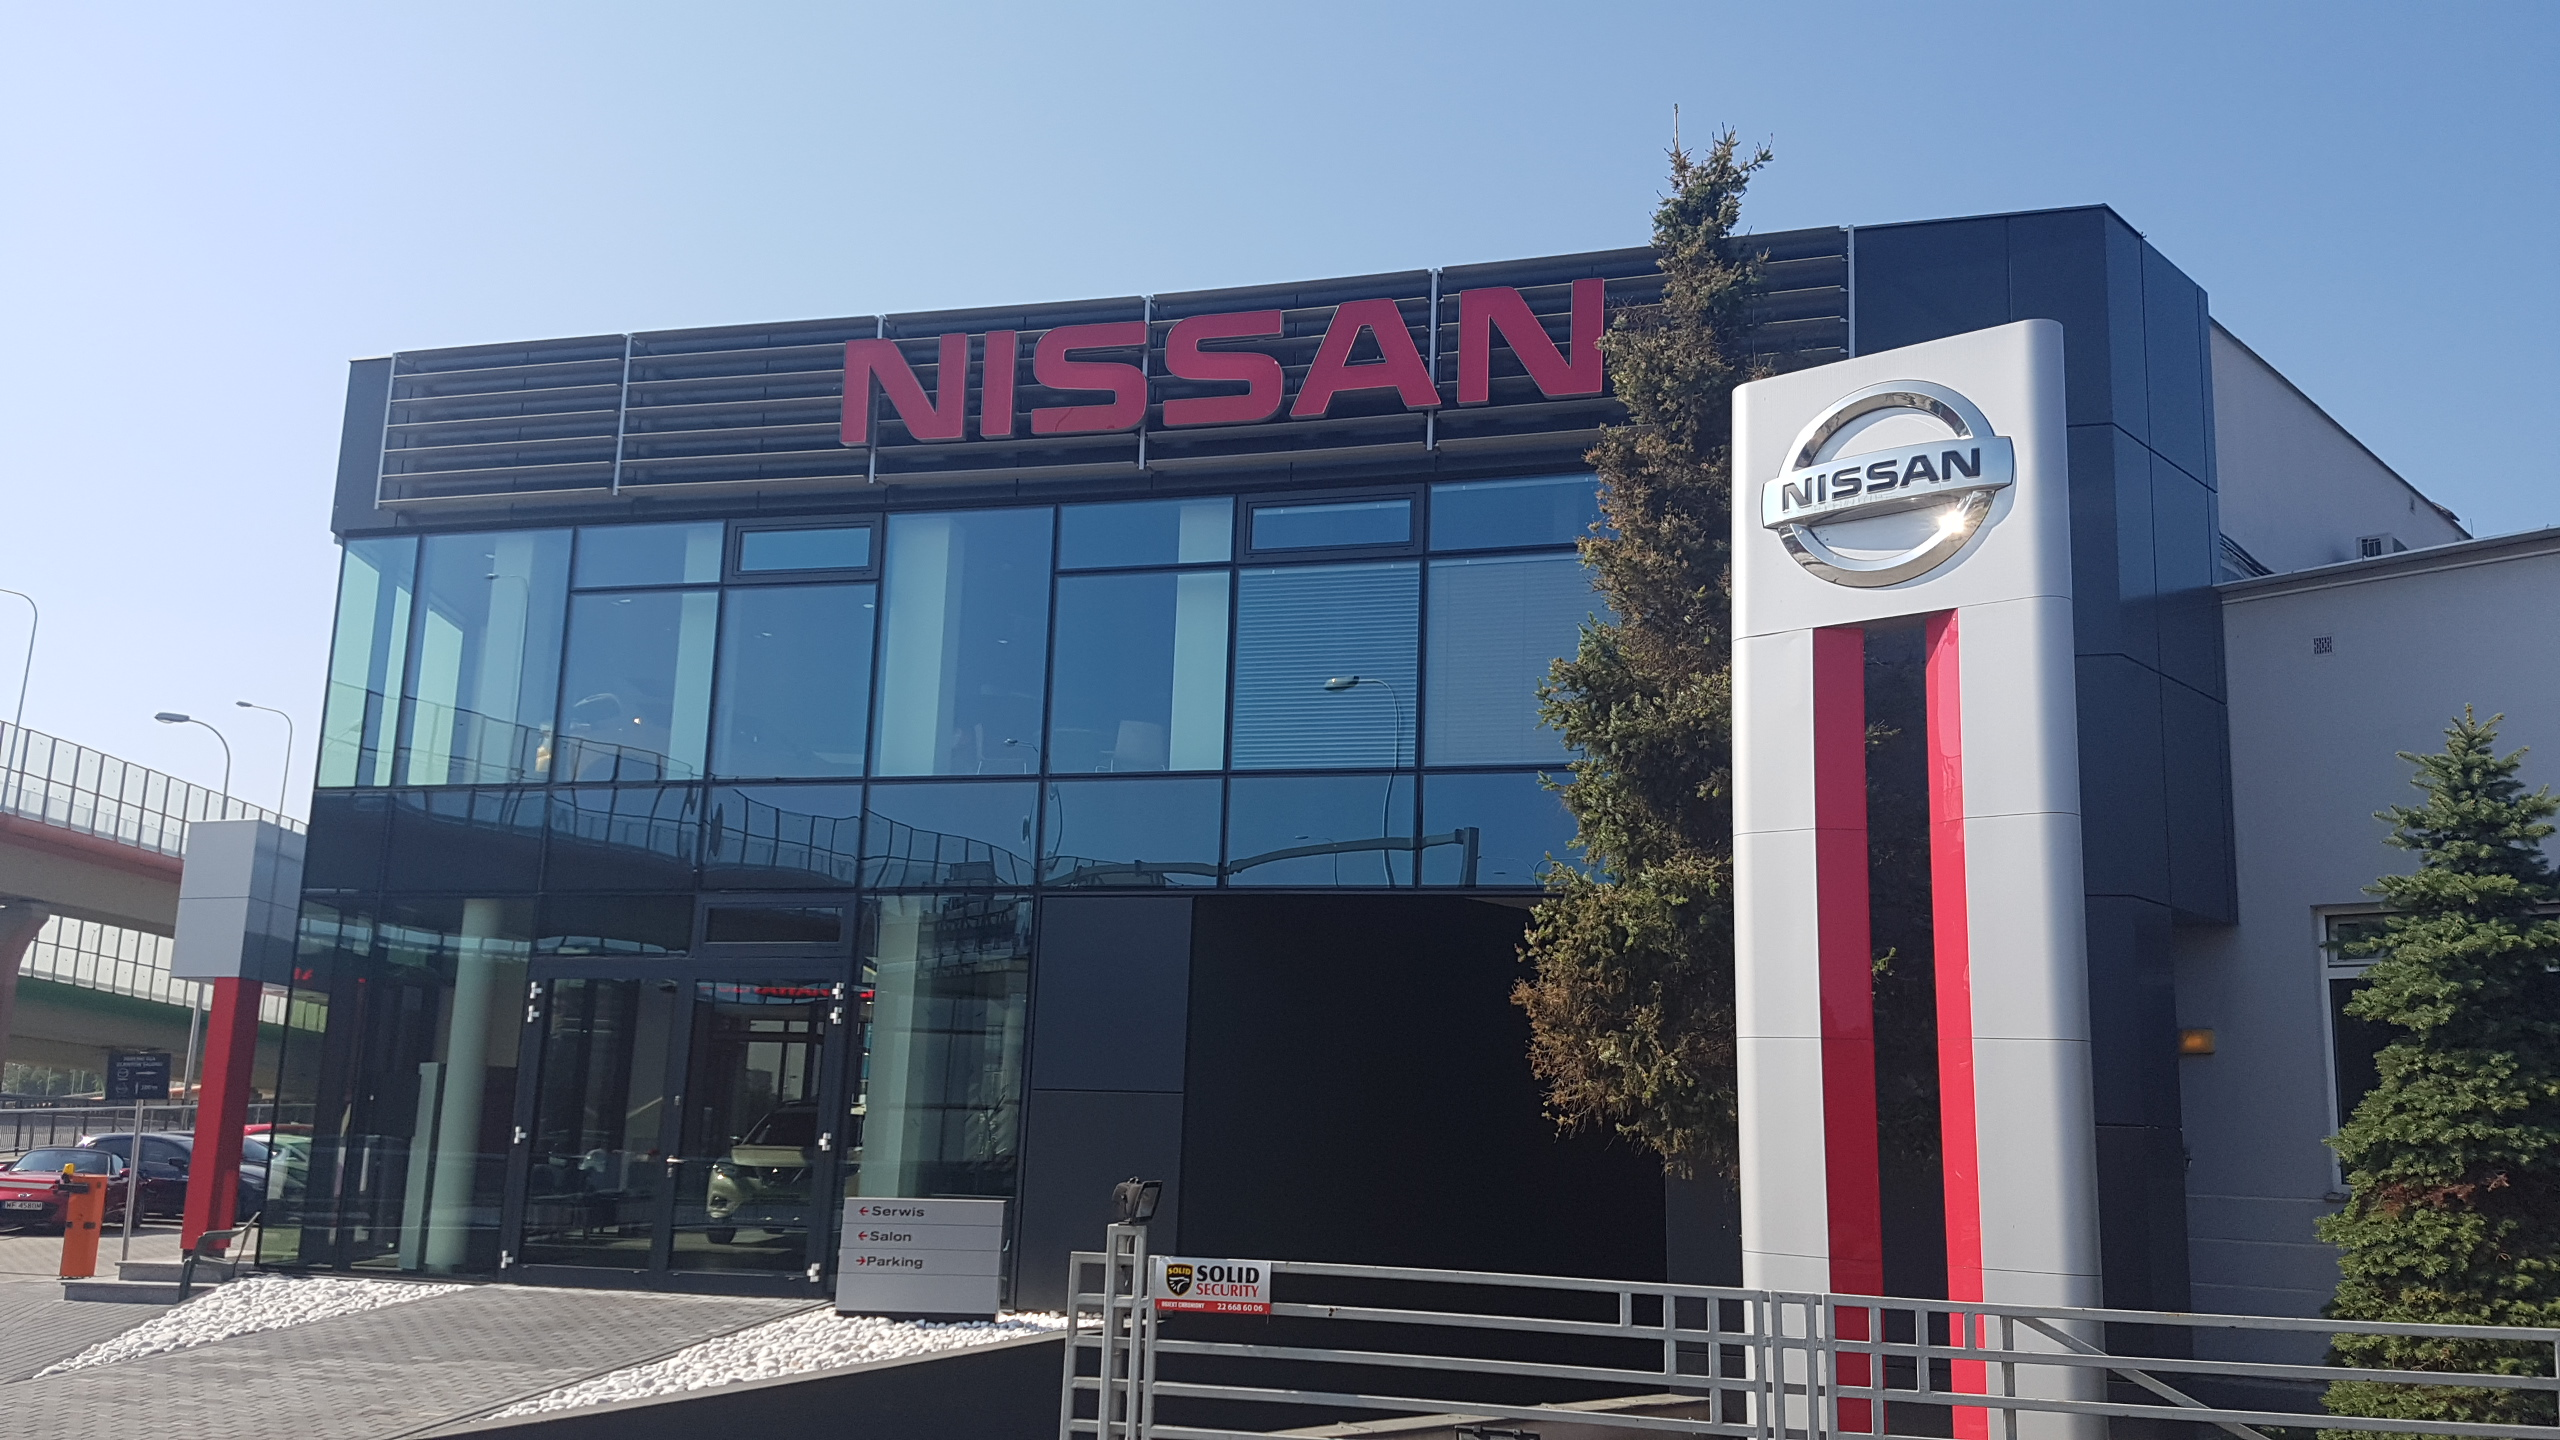 Nissan - Autohaus